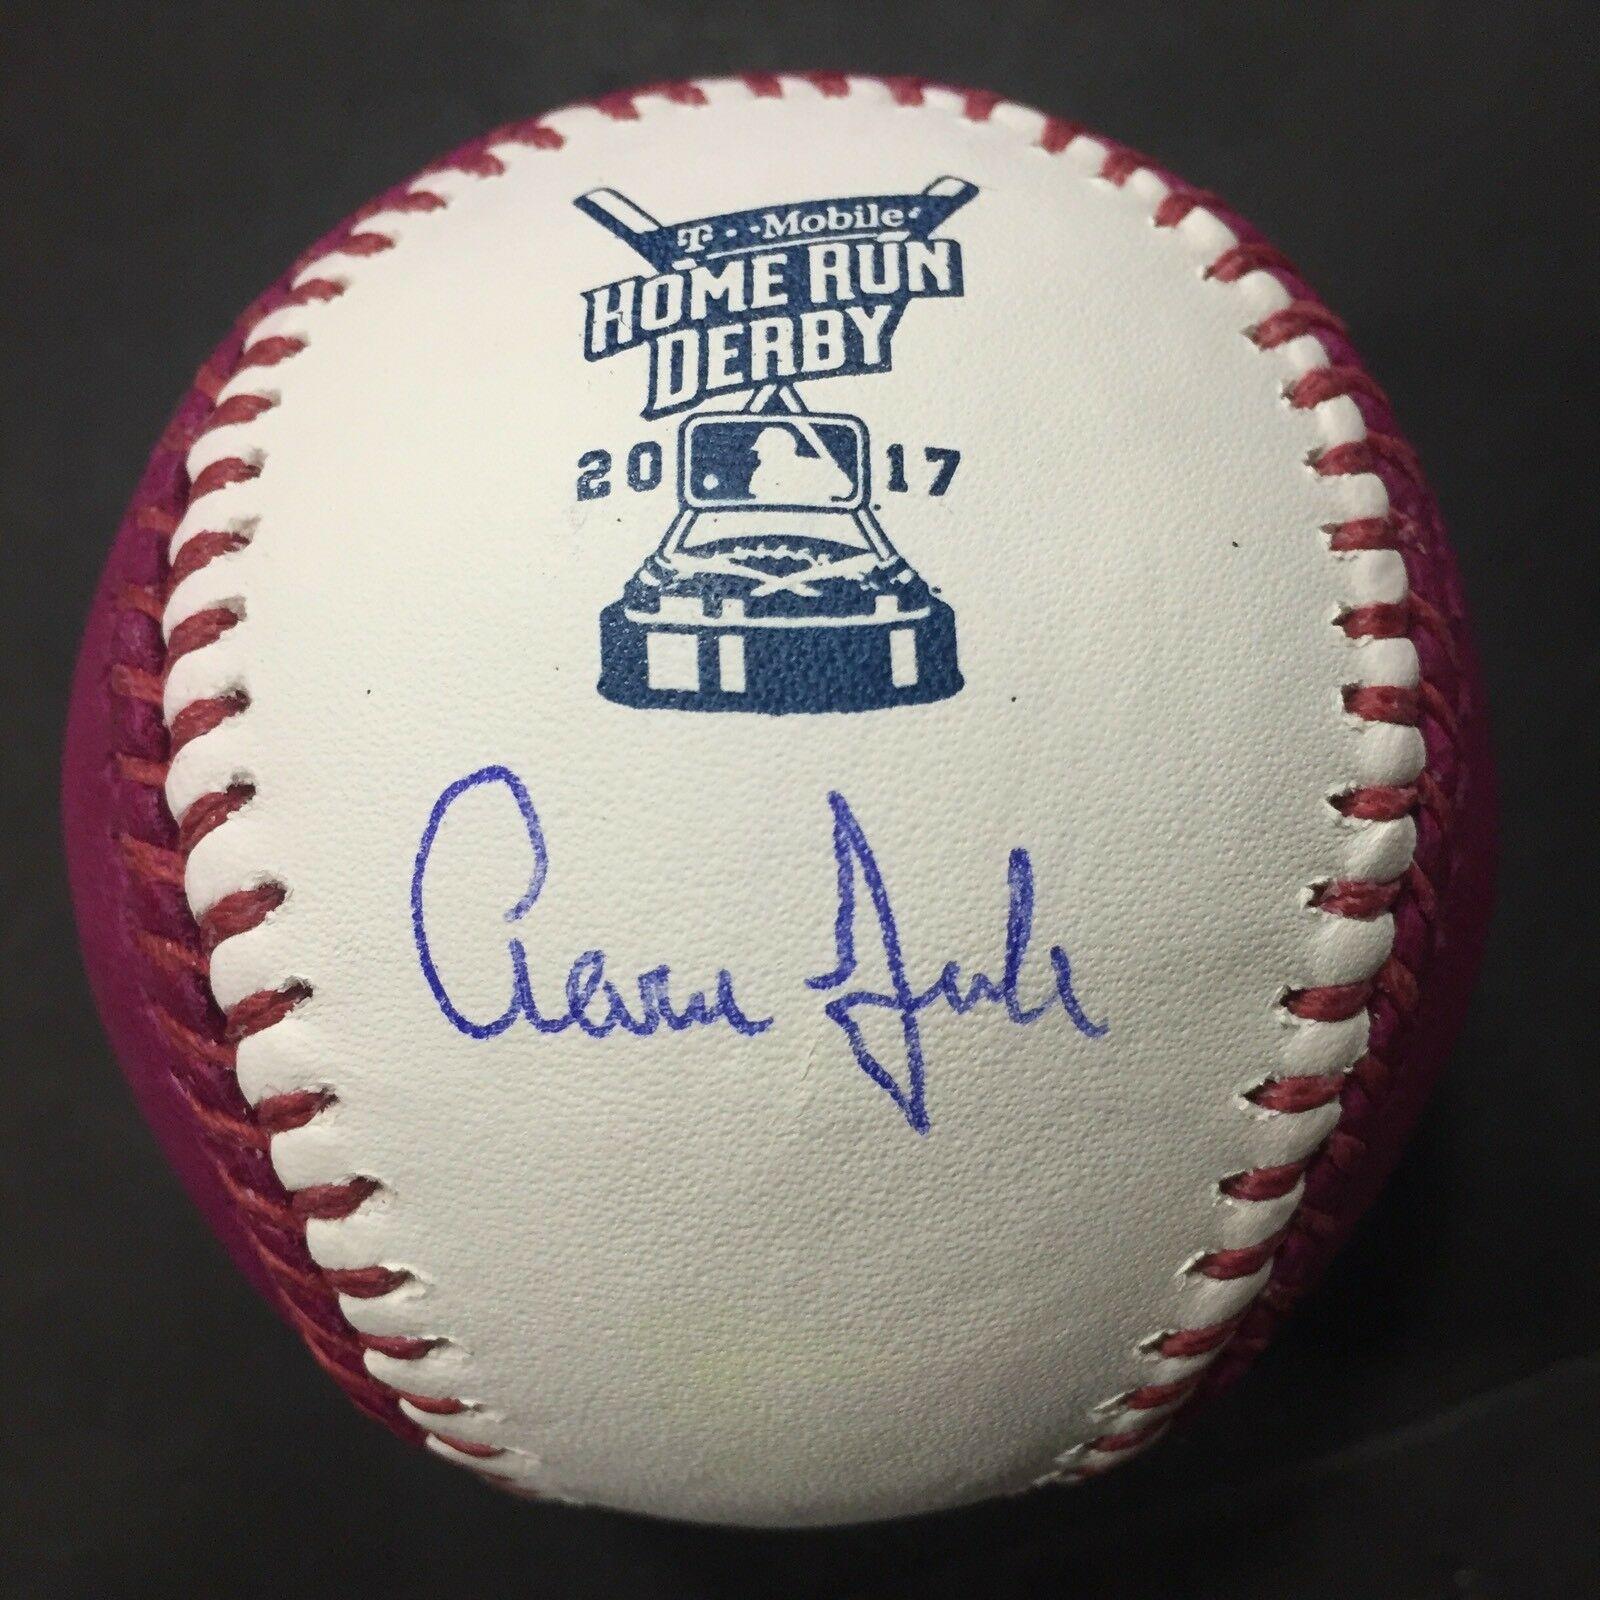 AARON JUDGE Signed 2017 Home Run Derby Moneyball Baseball FANATICS Coa Autograph